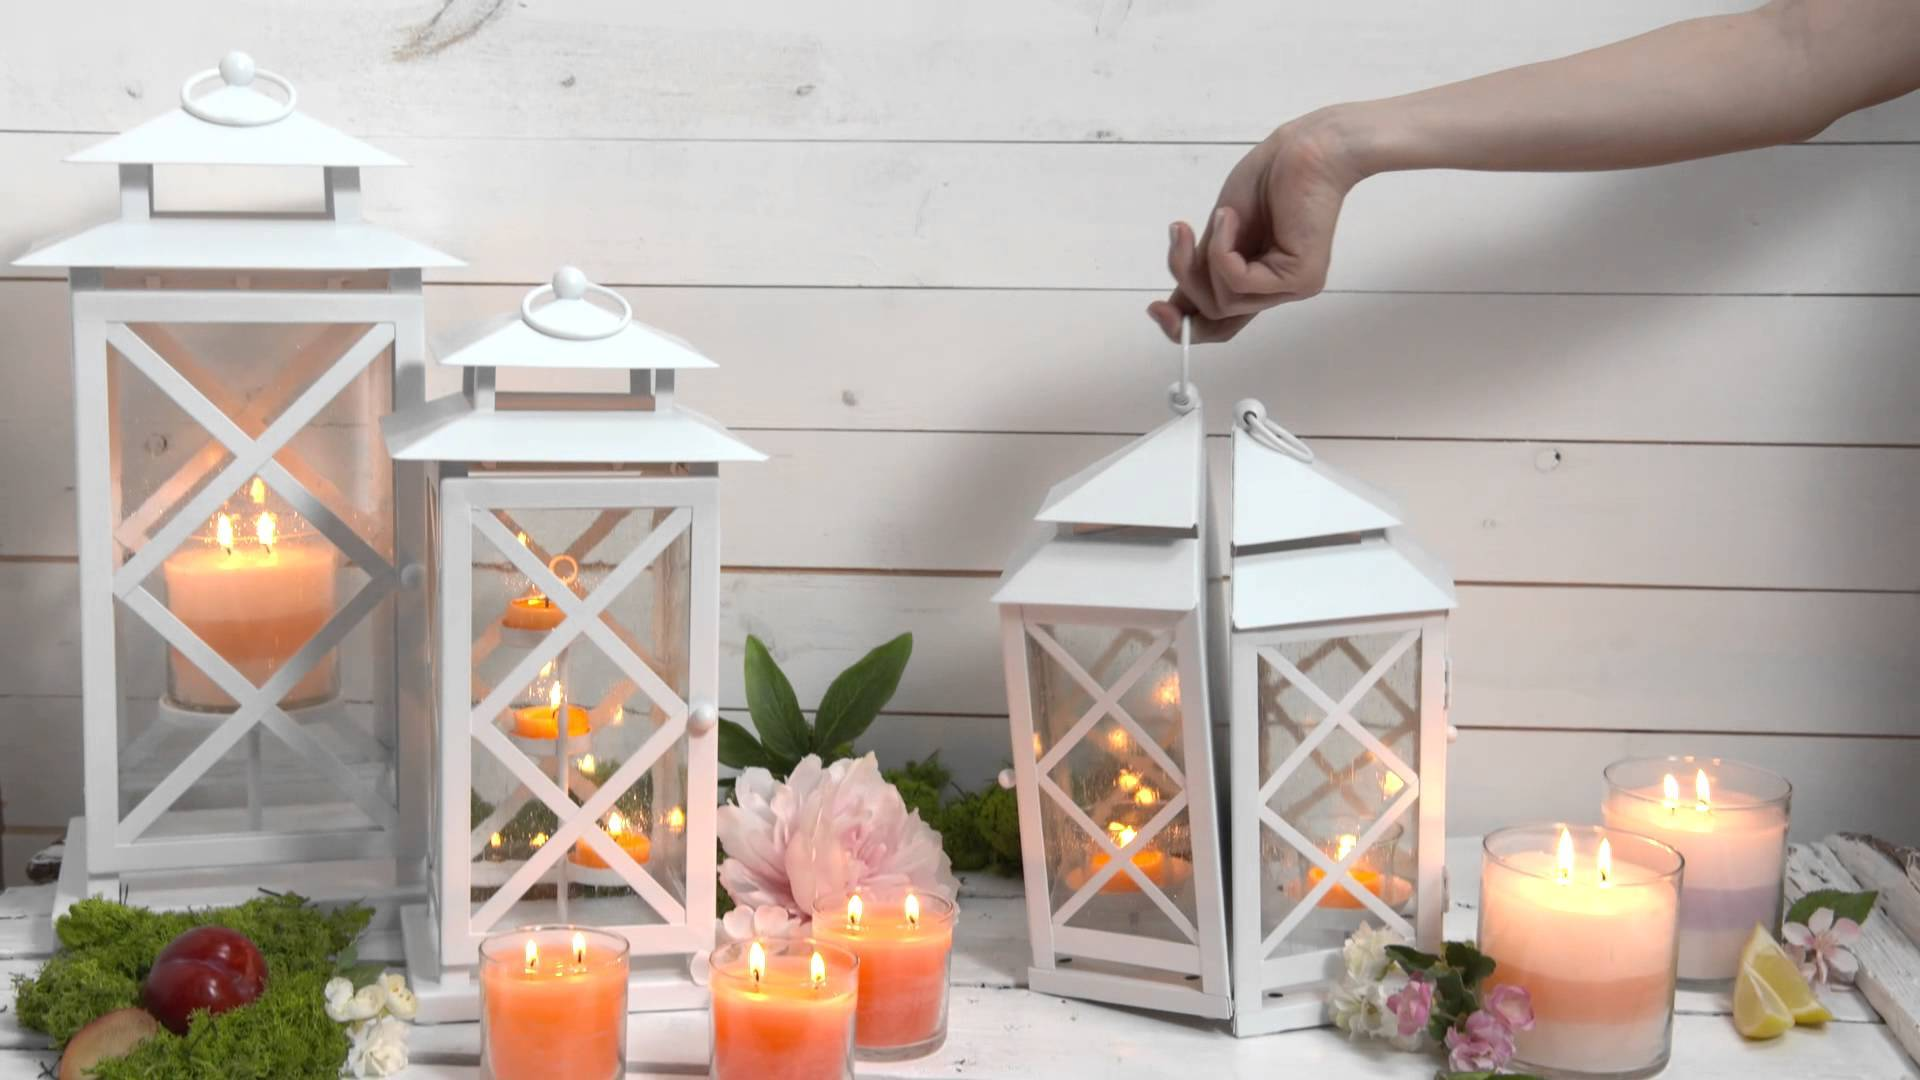 Luci Fai Da Te lanterne da giardino fai da te, idee giardino arredando